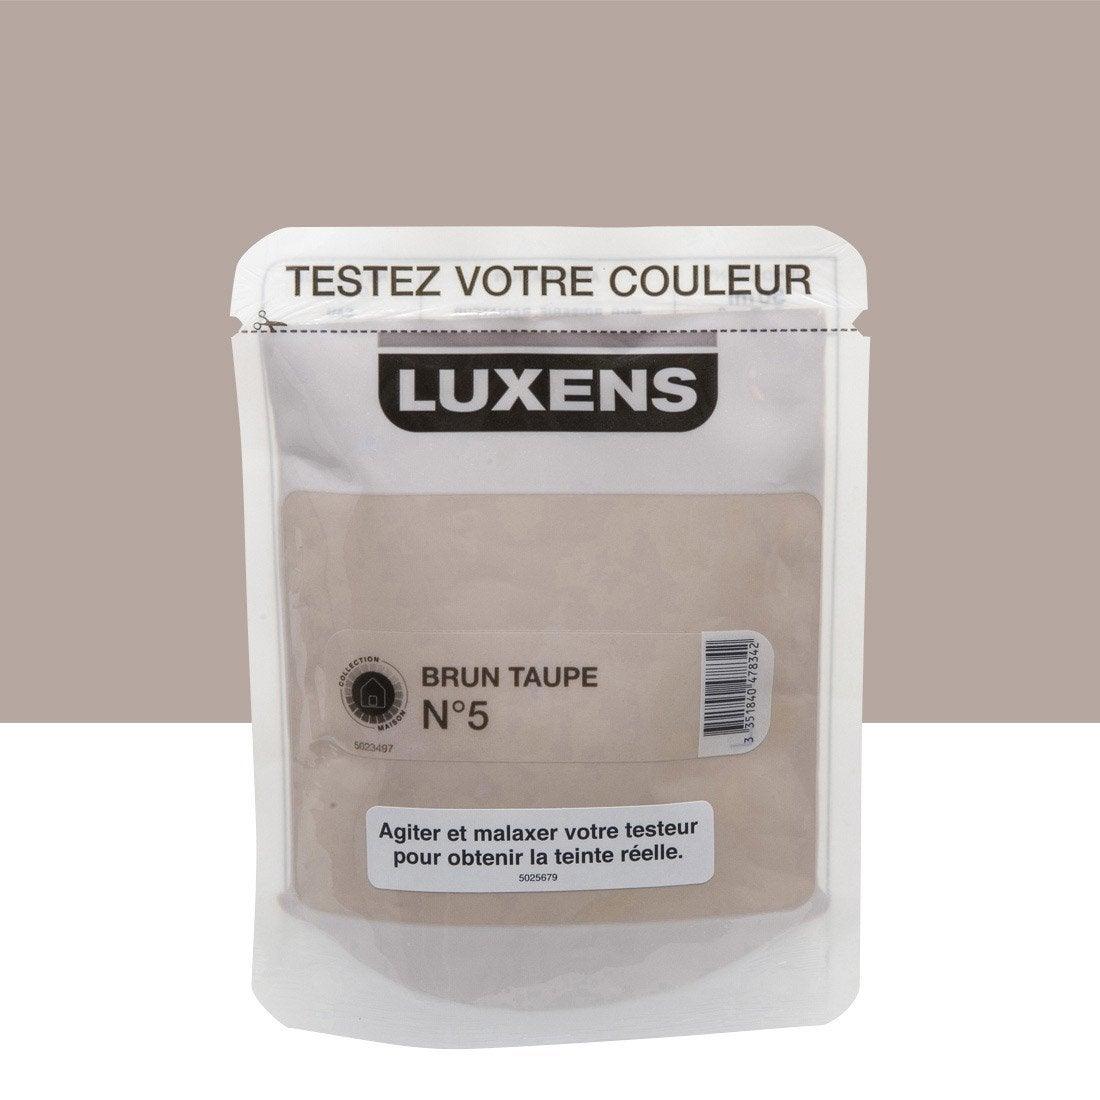 Testeur peinture brun taupe 5 luxens couleurs int rieures satin l leroy merlin for Peinture mur leroy merlin